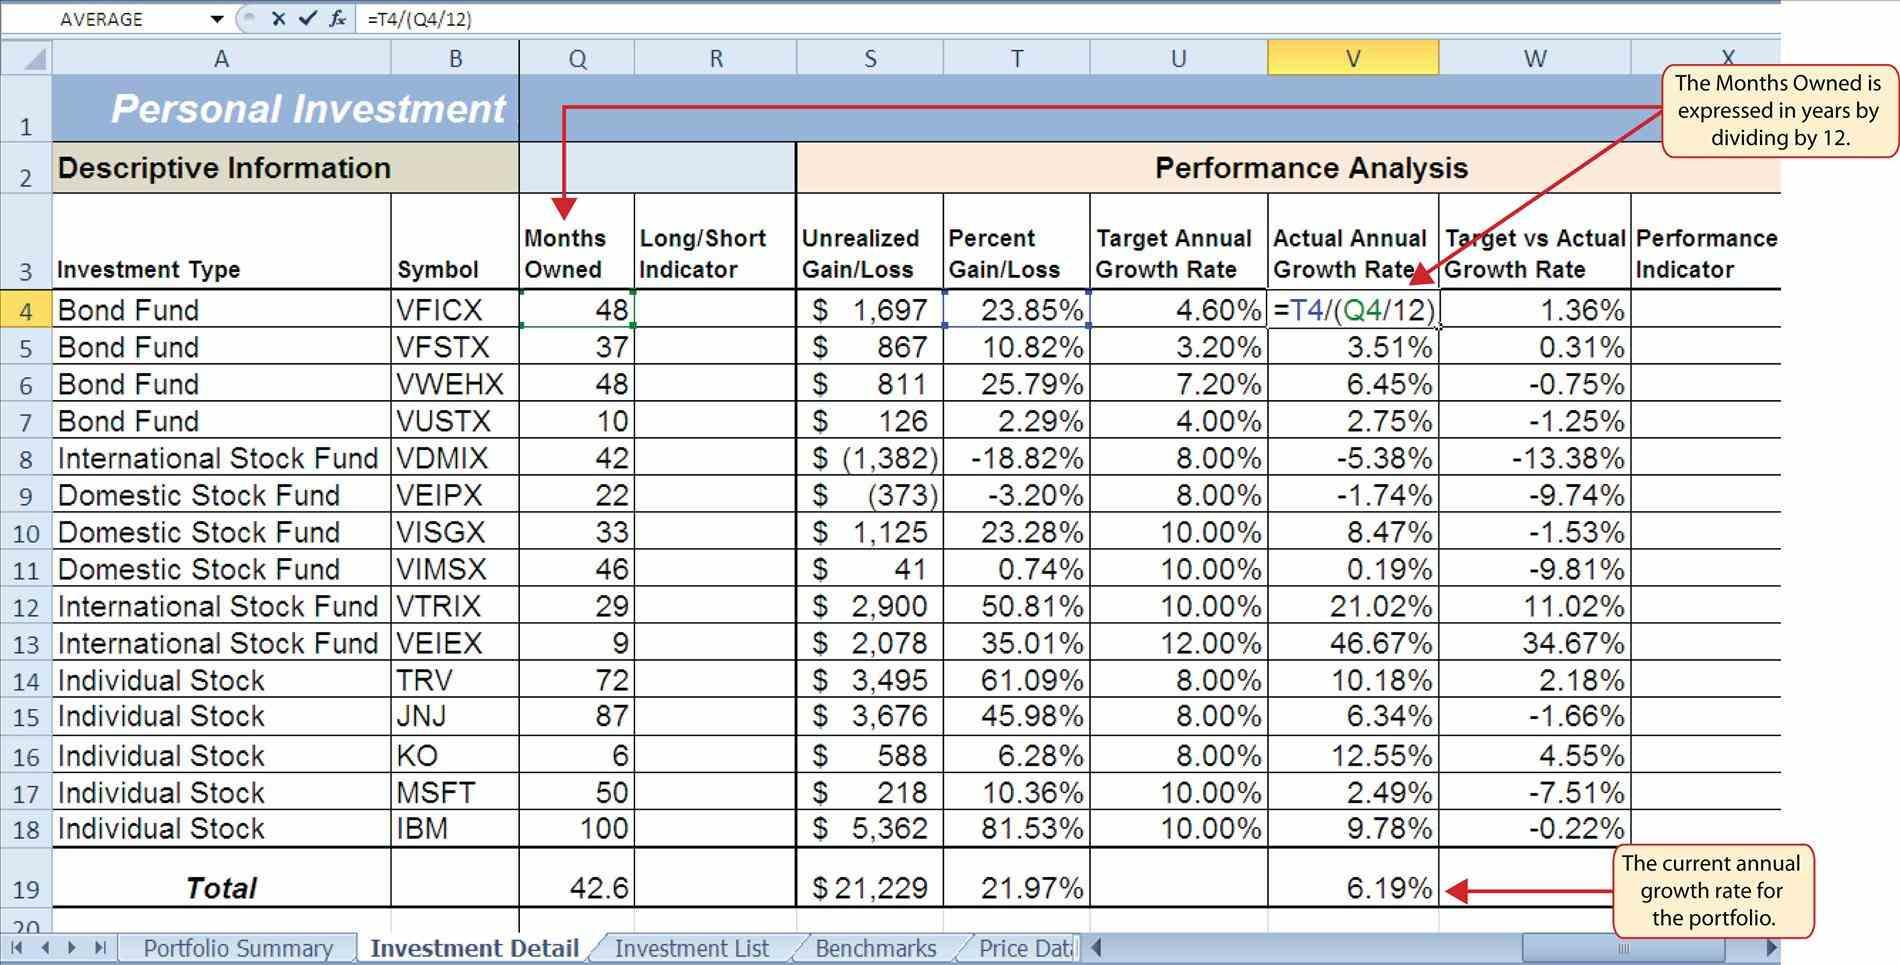 Residential Rental Property Analysis Spreadsheet   Papillon-Northwan intended for Rental Property Analysis Spreadsheet